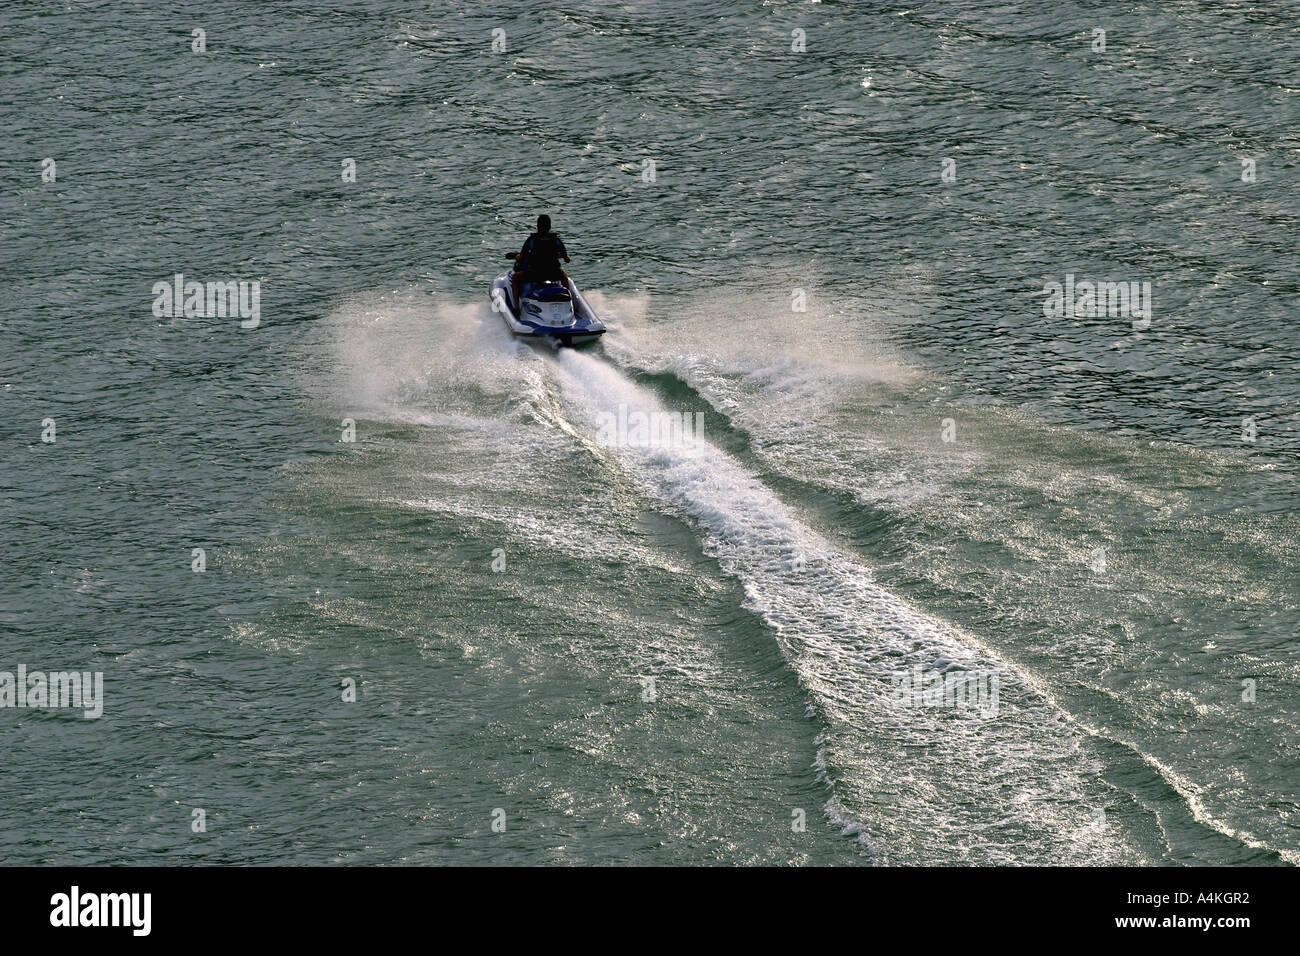 Person riding jetski, high angle view Stock Photo